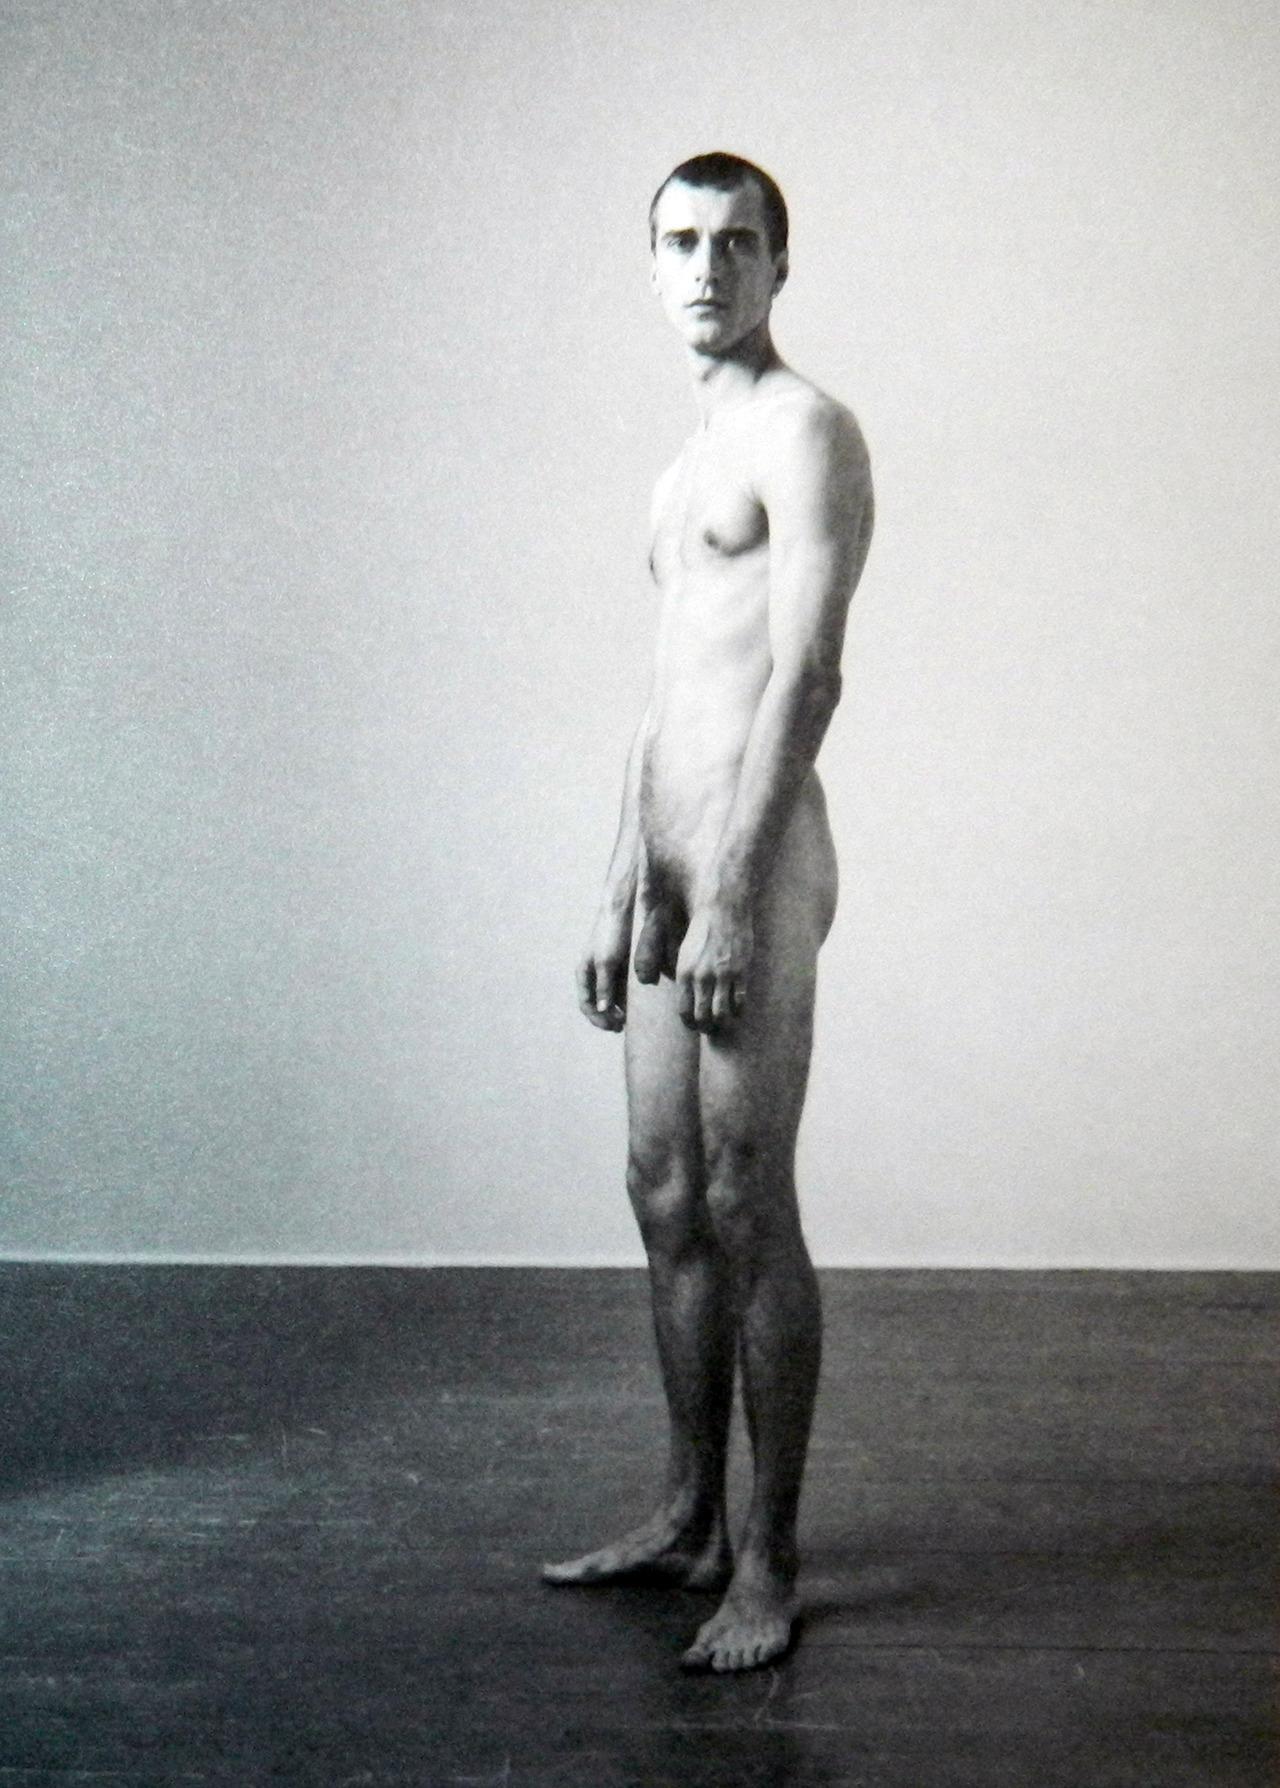 Clément-Willy_Vanderperre.jpg